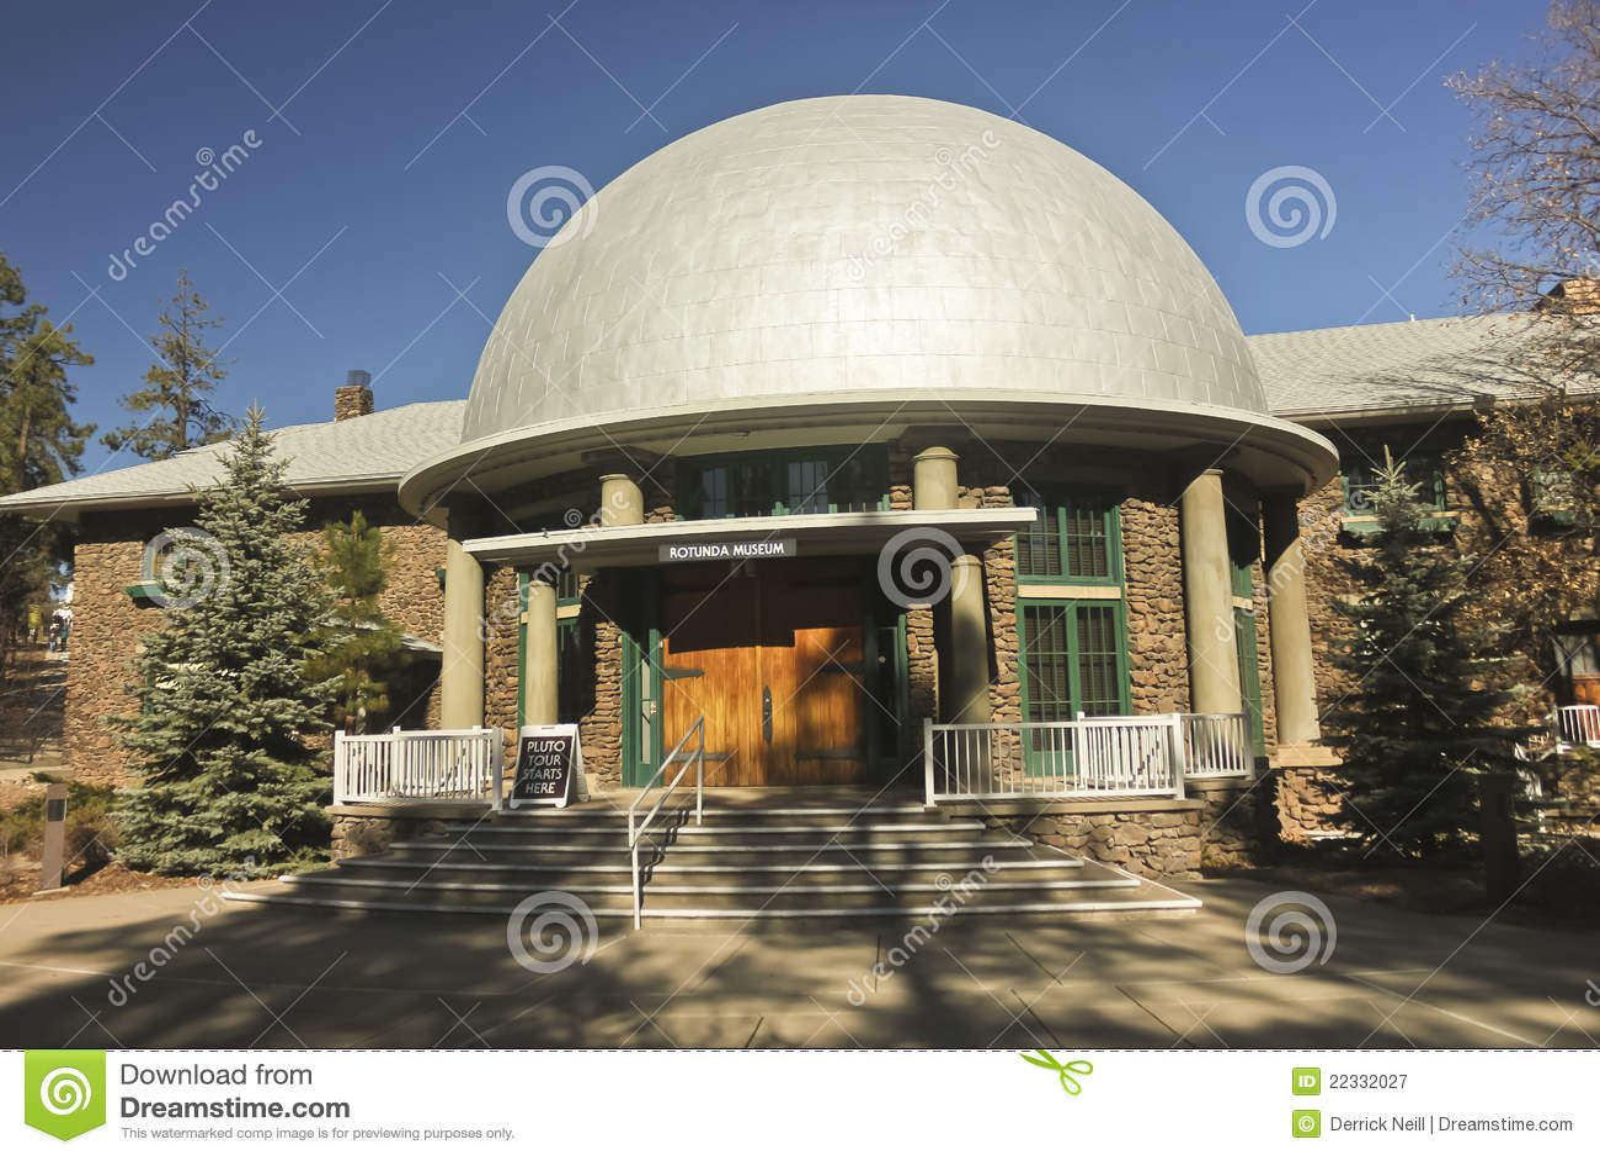 Une vue du musée rotunda de Slipher